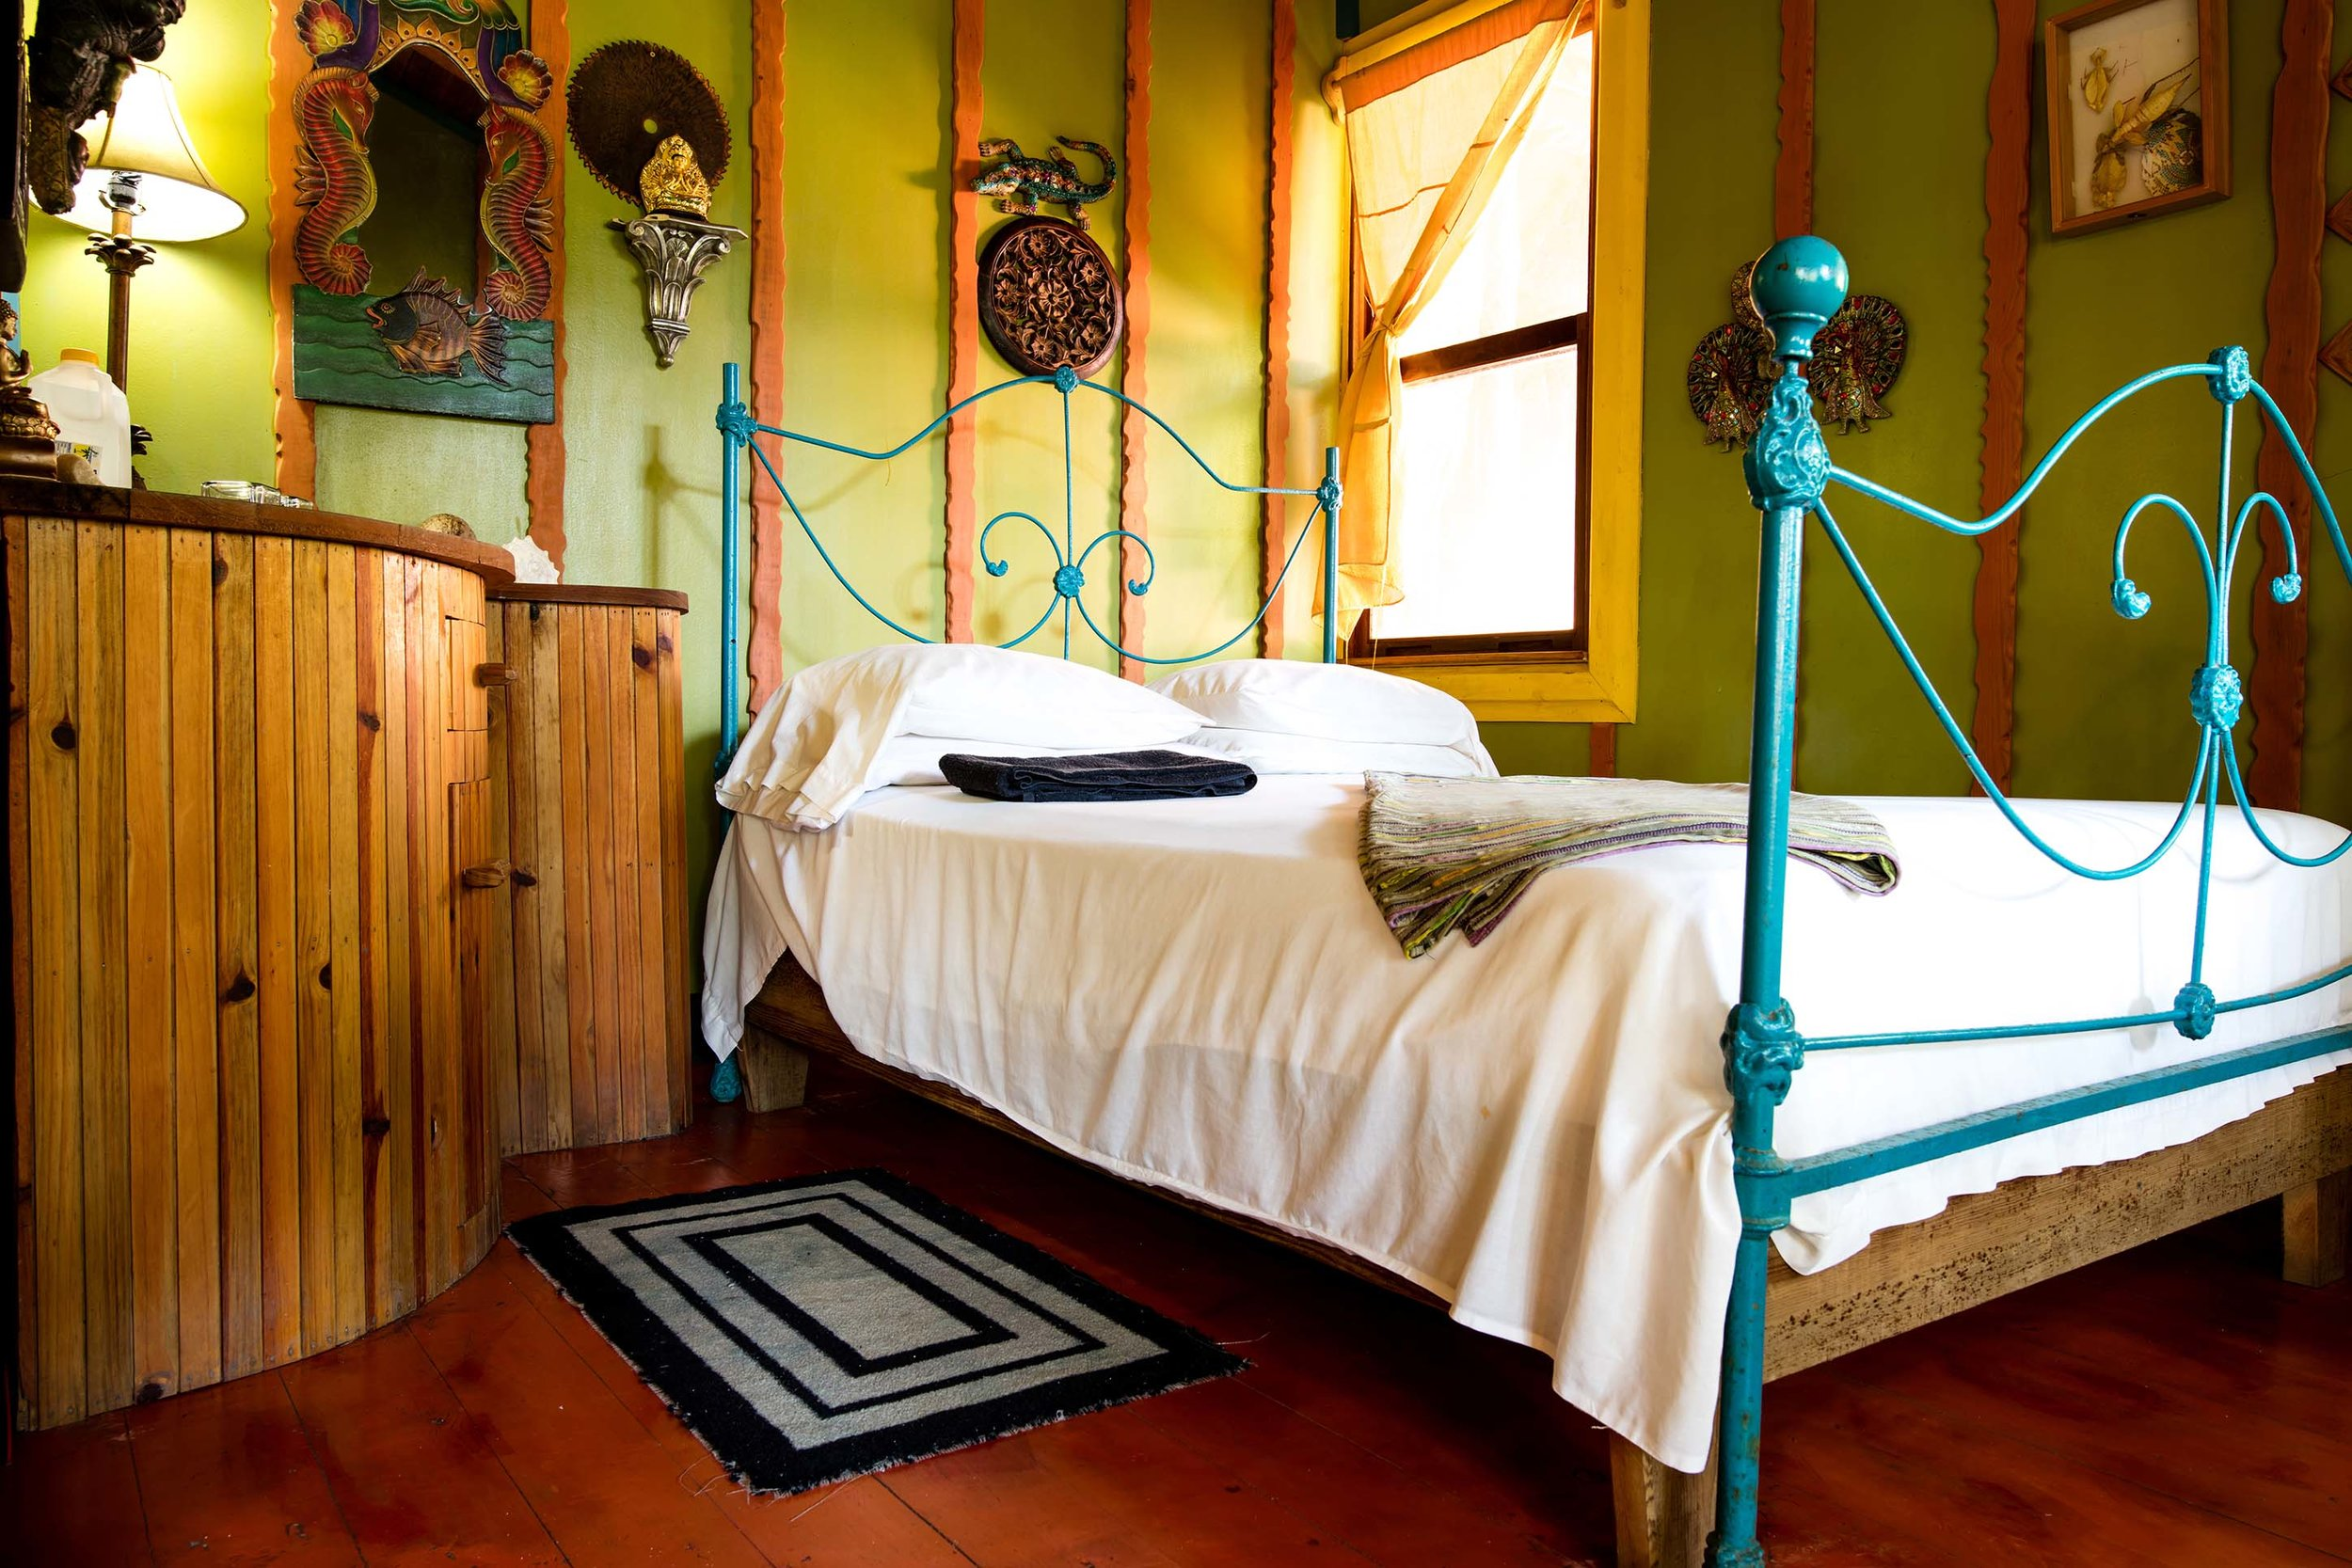 Warm lighting & romantic accommodations